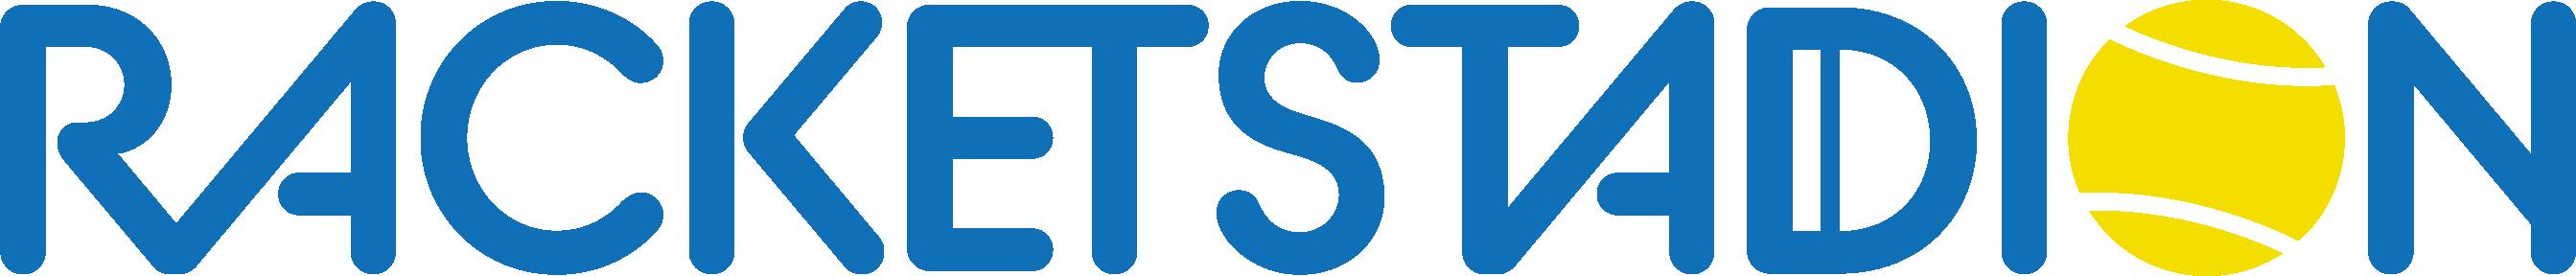 Racketstadion Logotyp